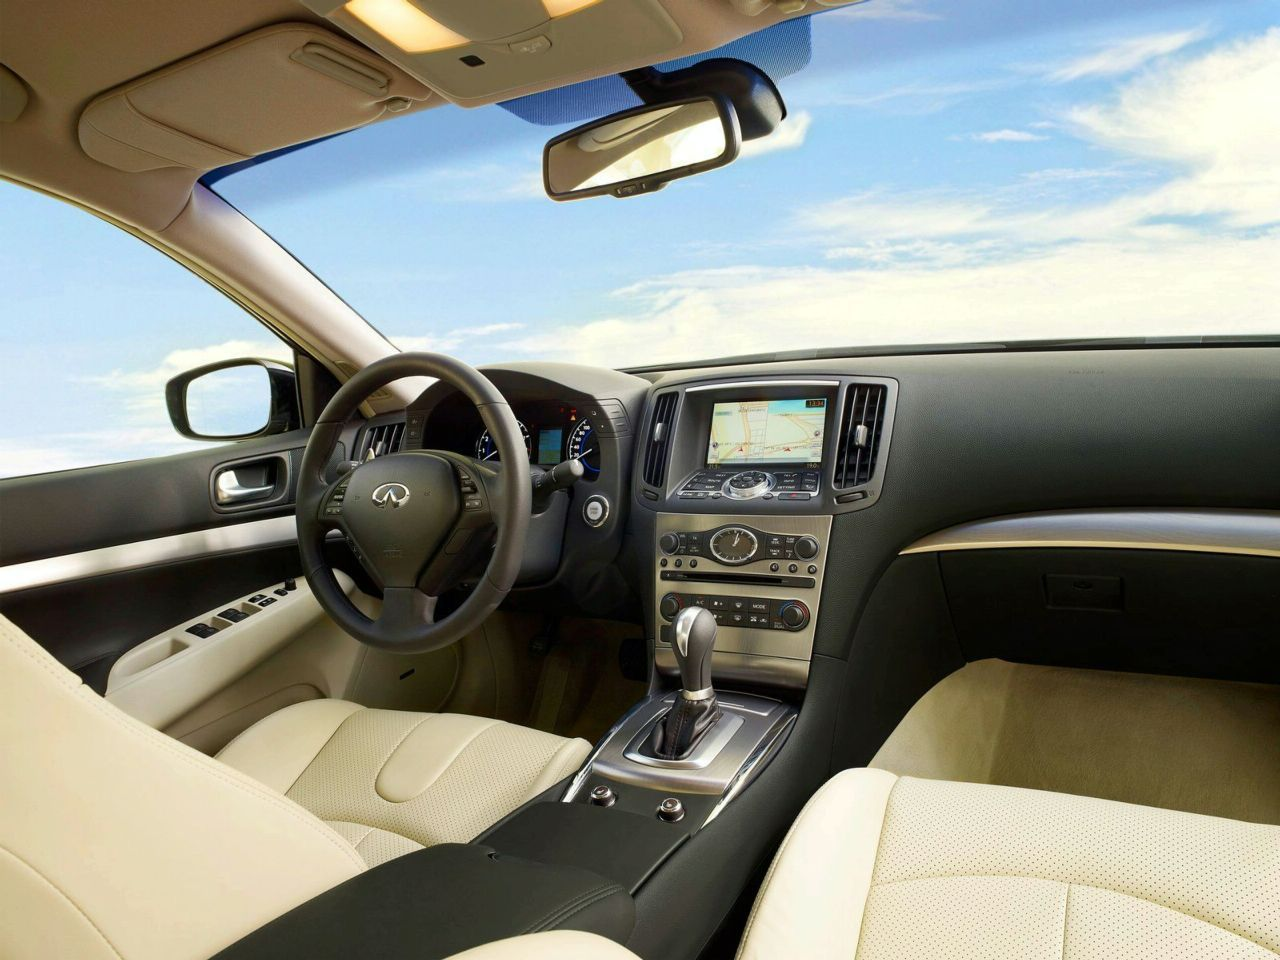 Used 2009 INFINITI G37 Sedan for Sale - G37 Sedan Pricing | Edmunds